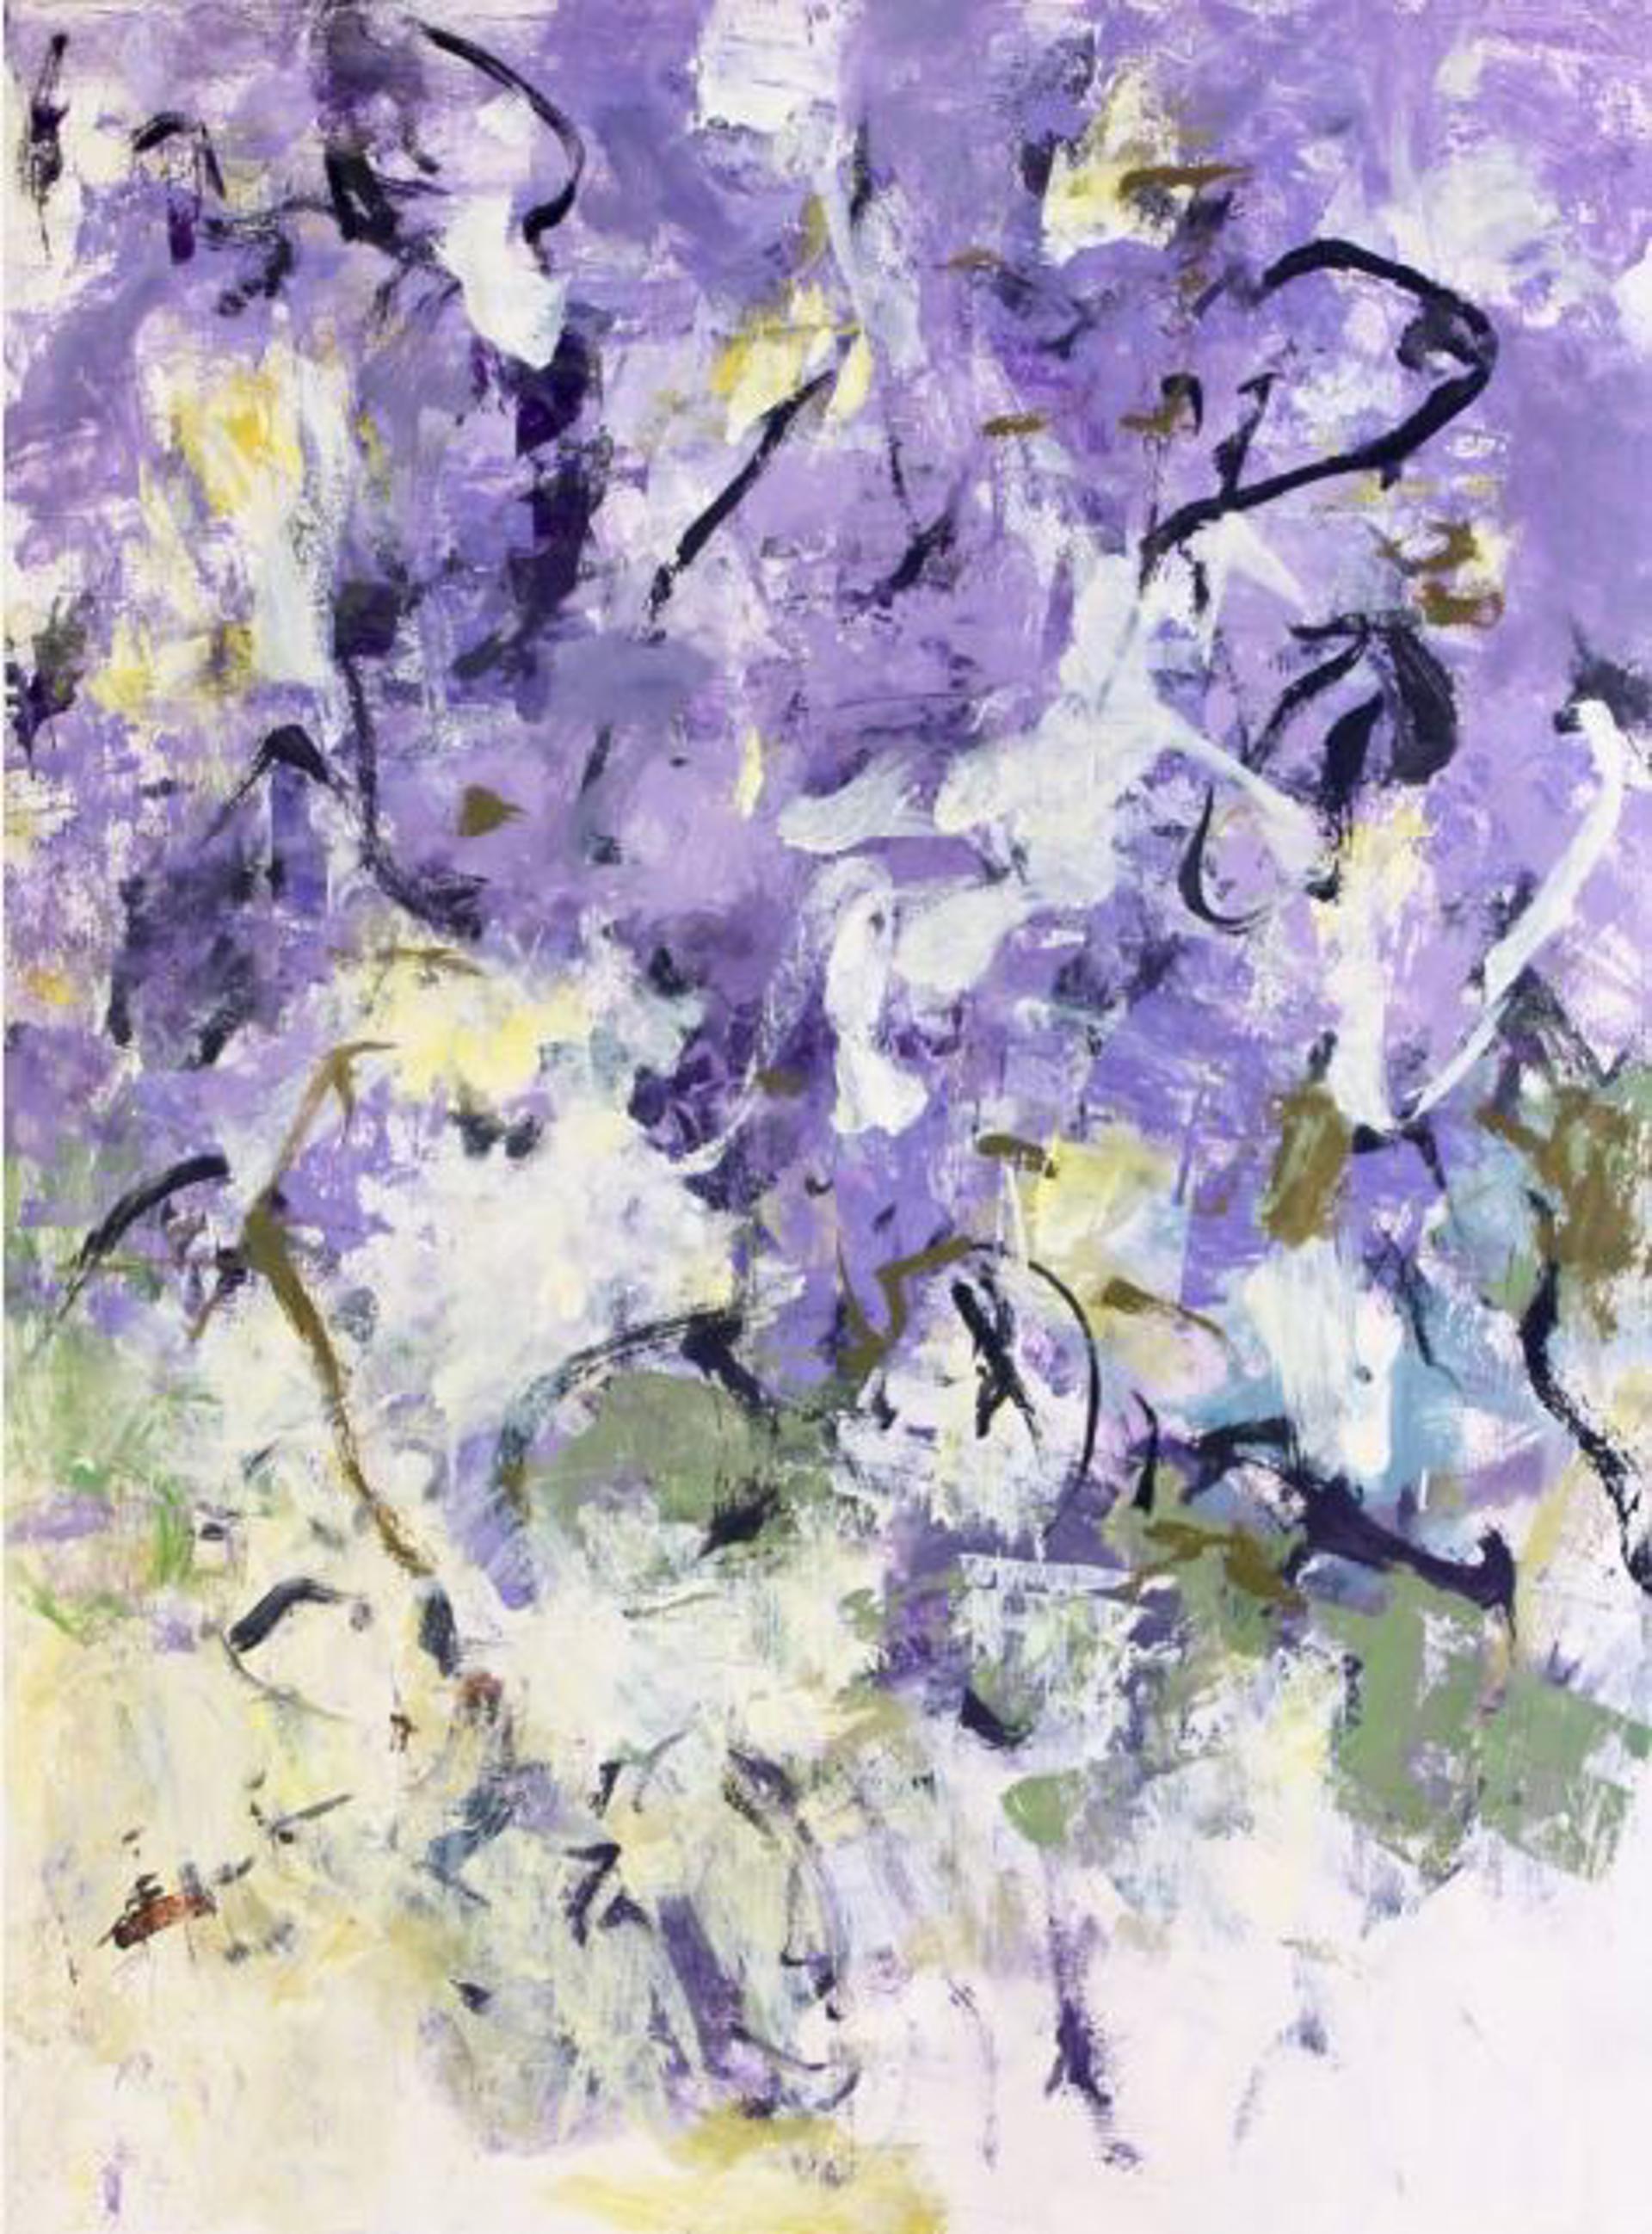 Spring Mix 2 by Ryan Cobourn